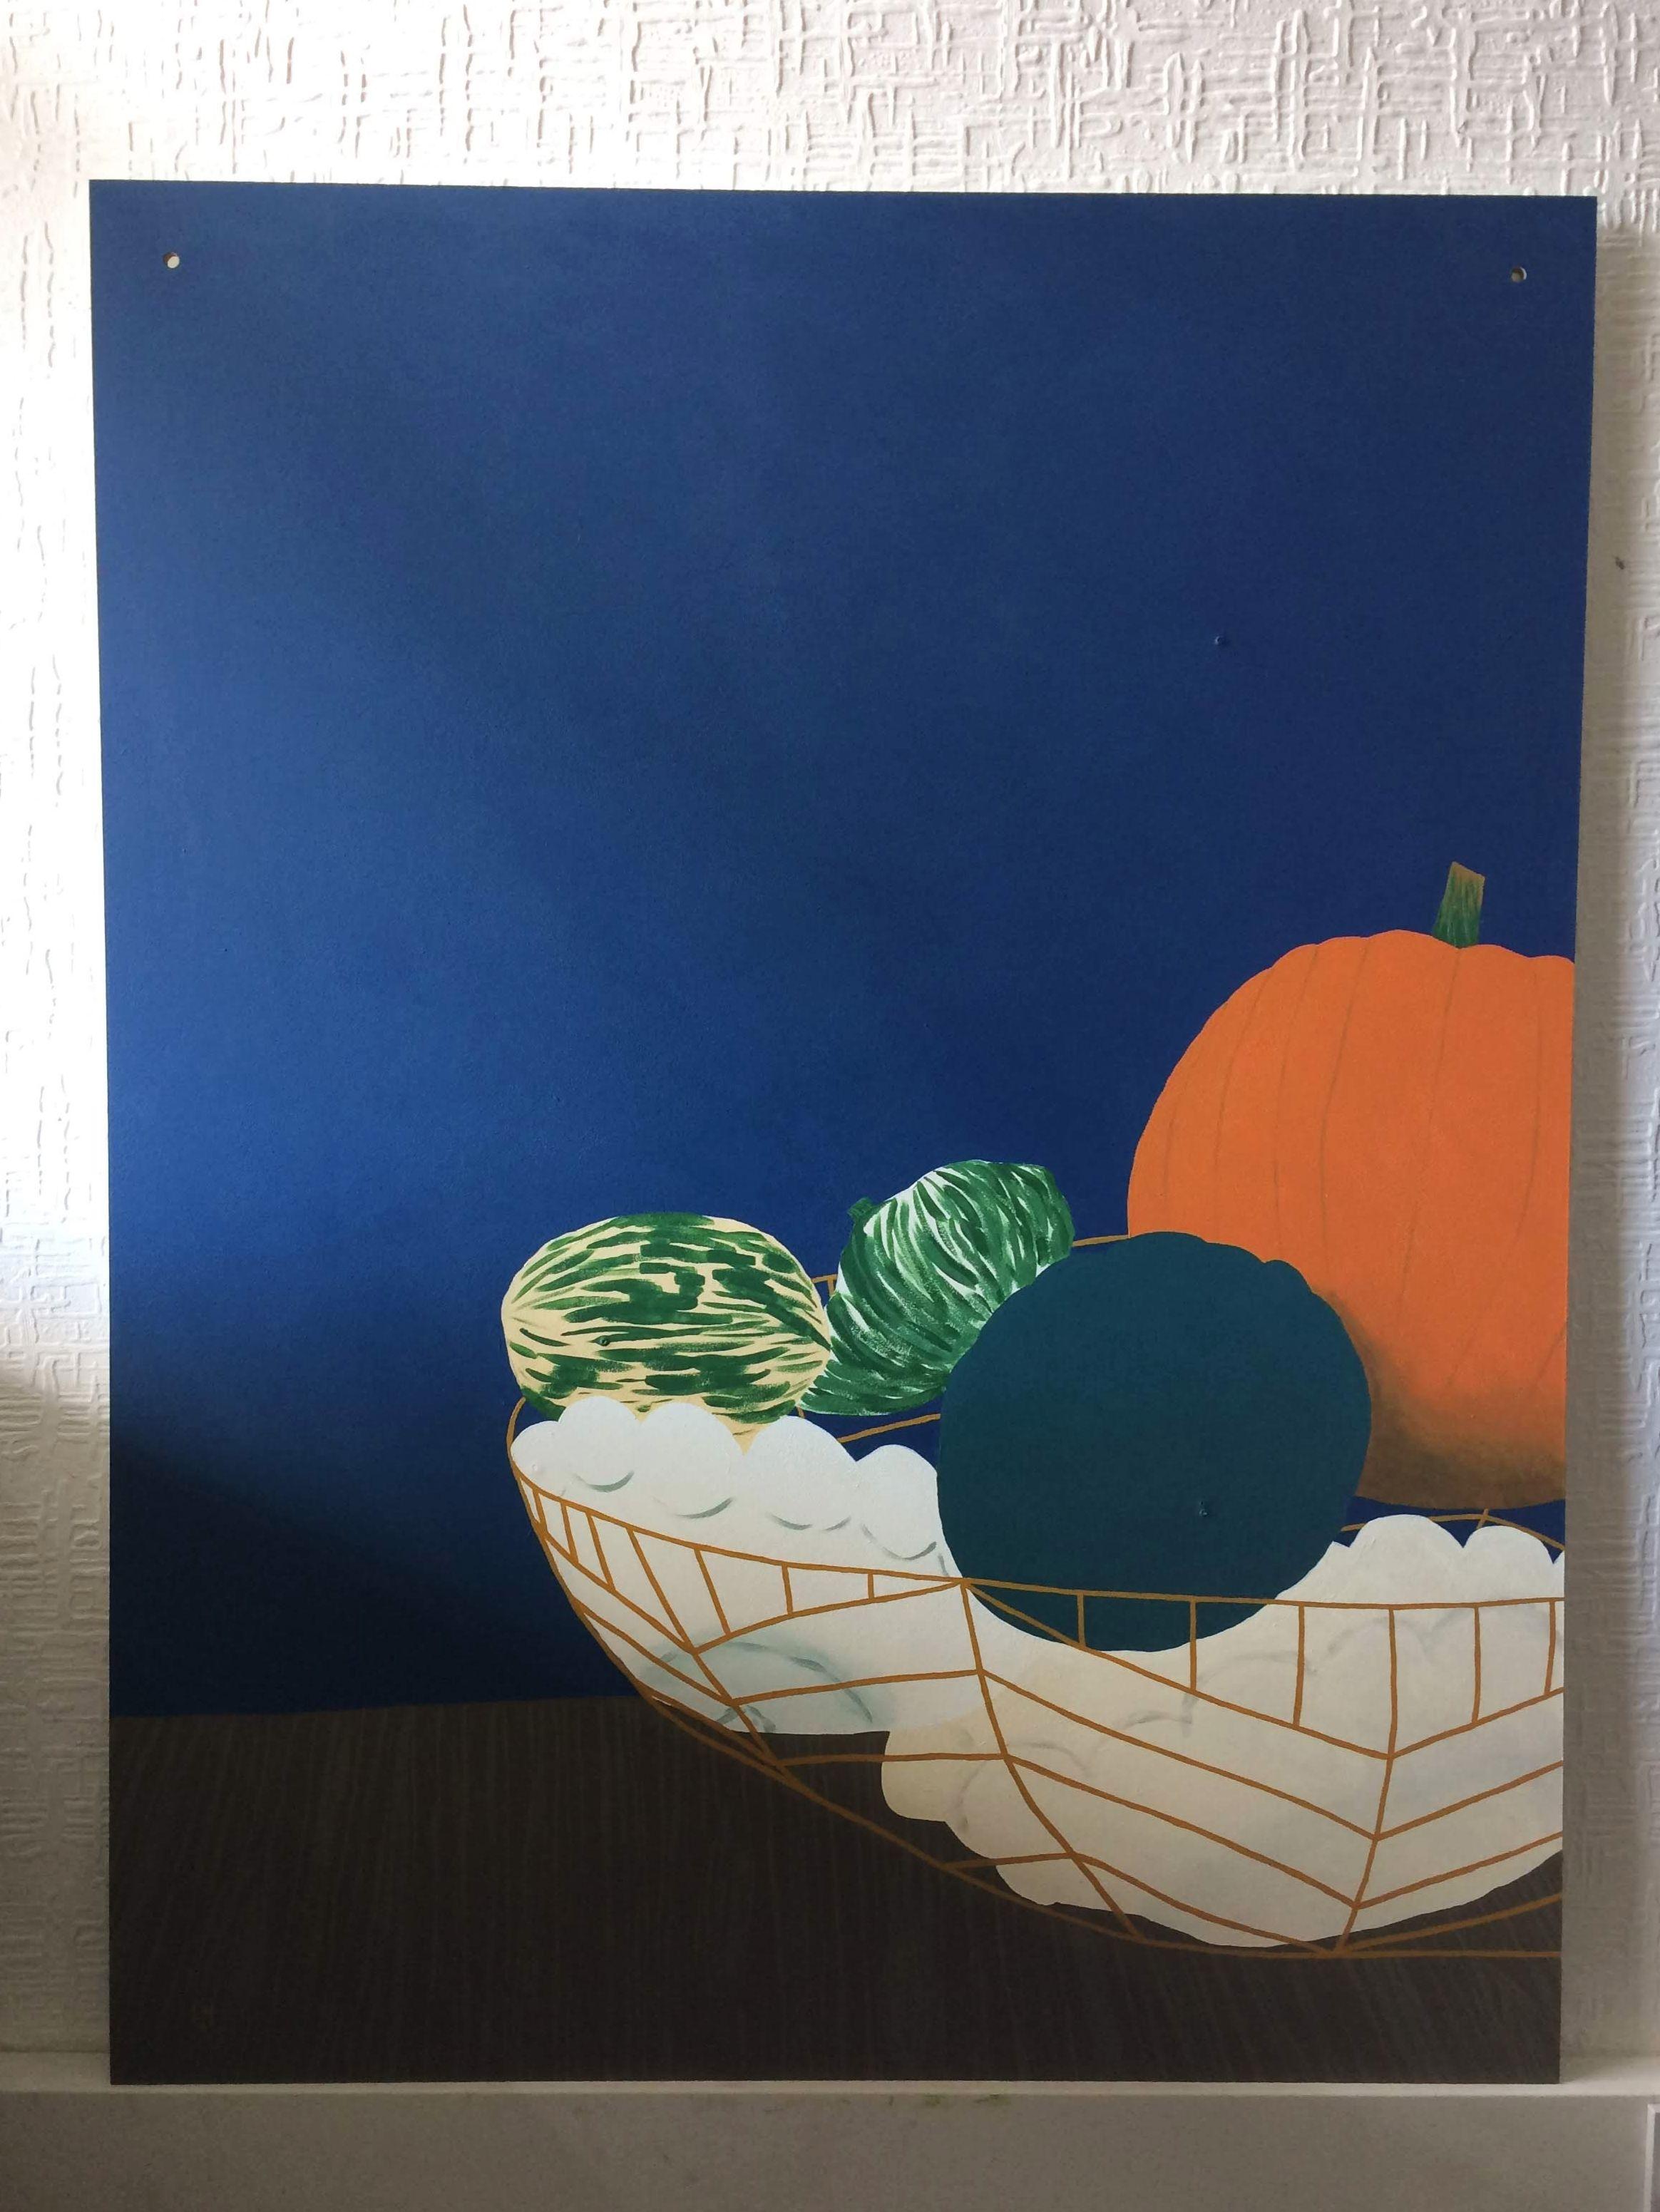 'Pumpkins in a Basket'